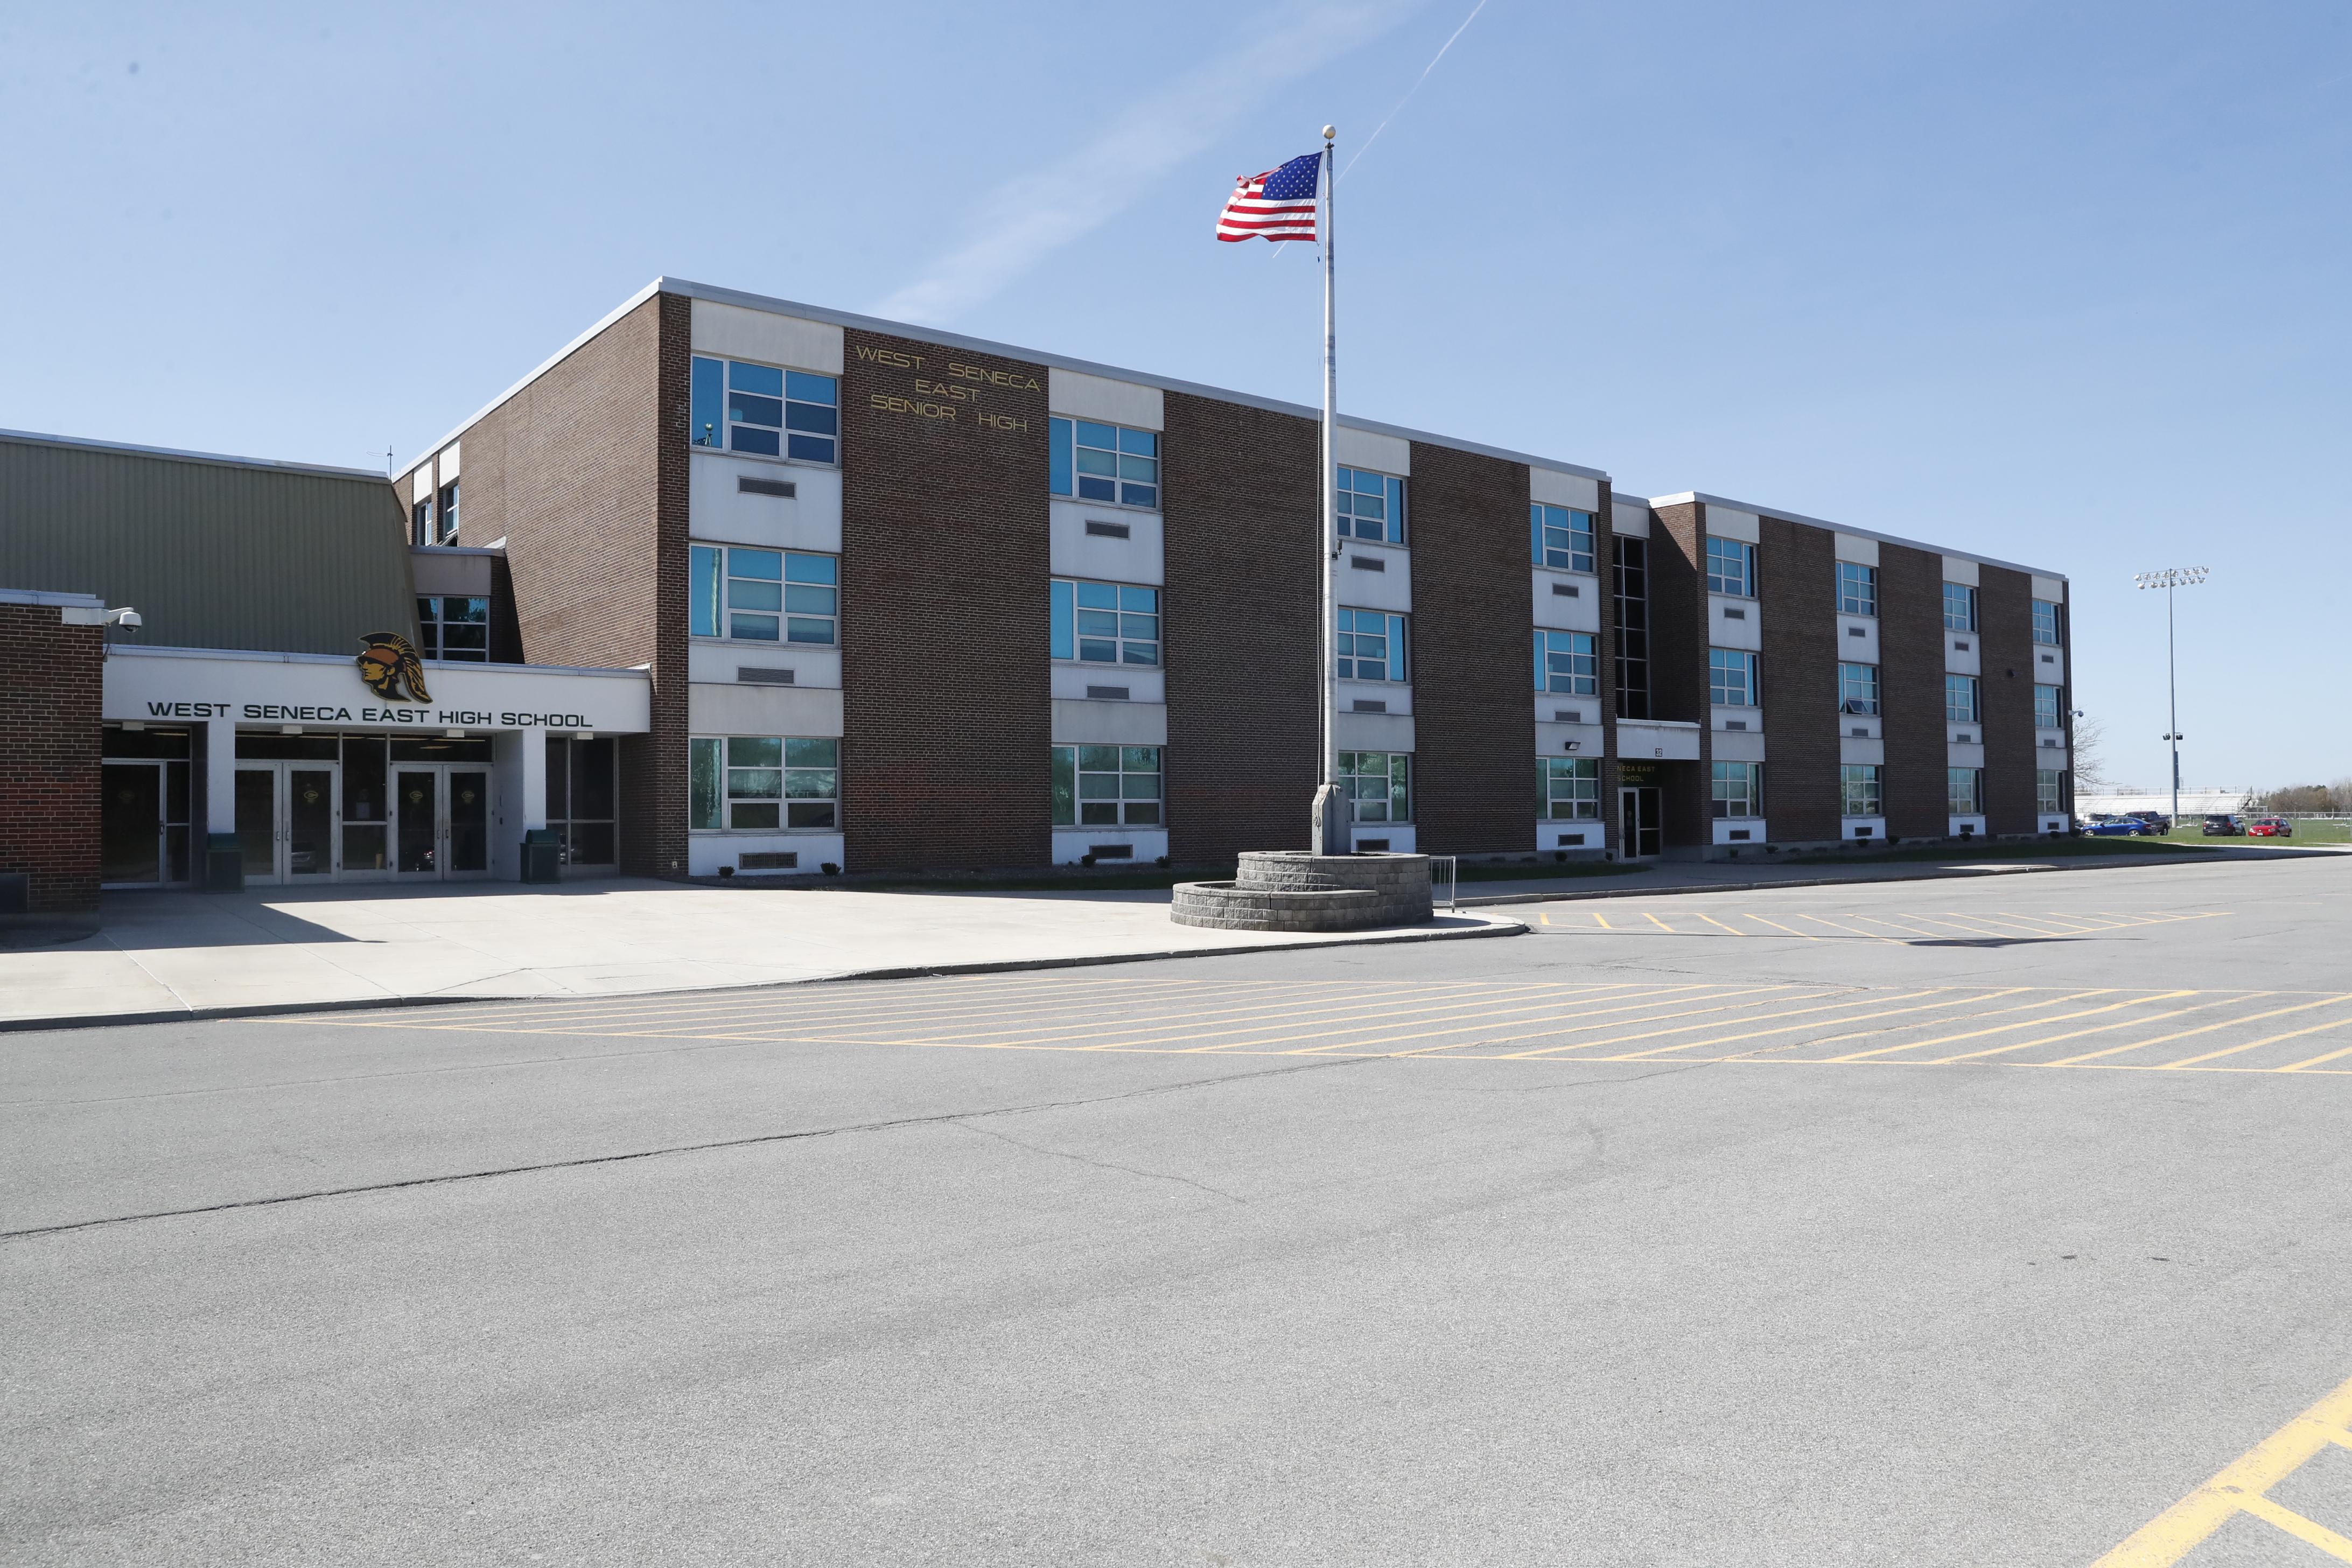 West Seneca East High School on Tuesday, April 18, 2017. (Harry Scull Jr./Buffalo News)